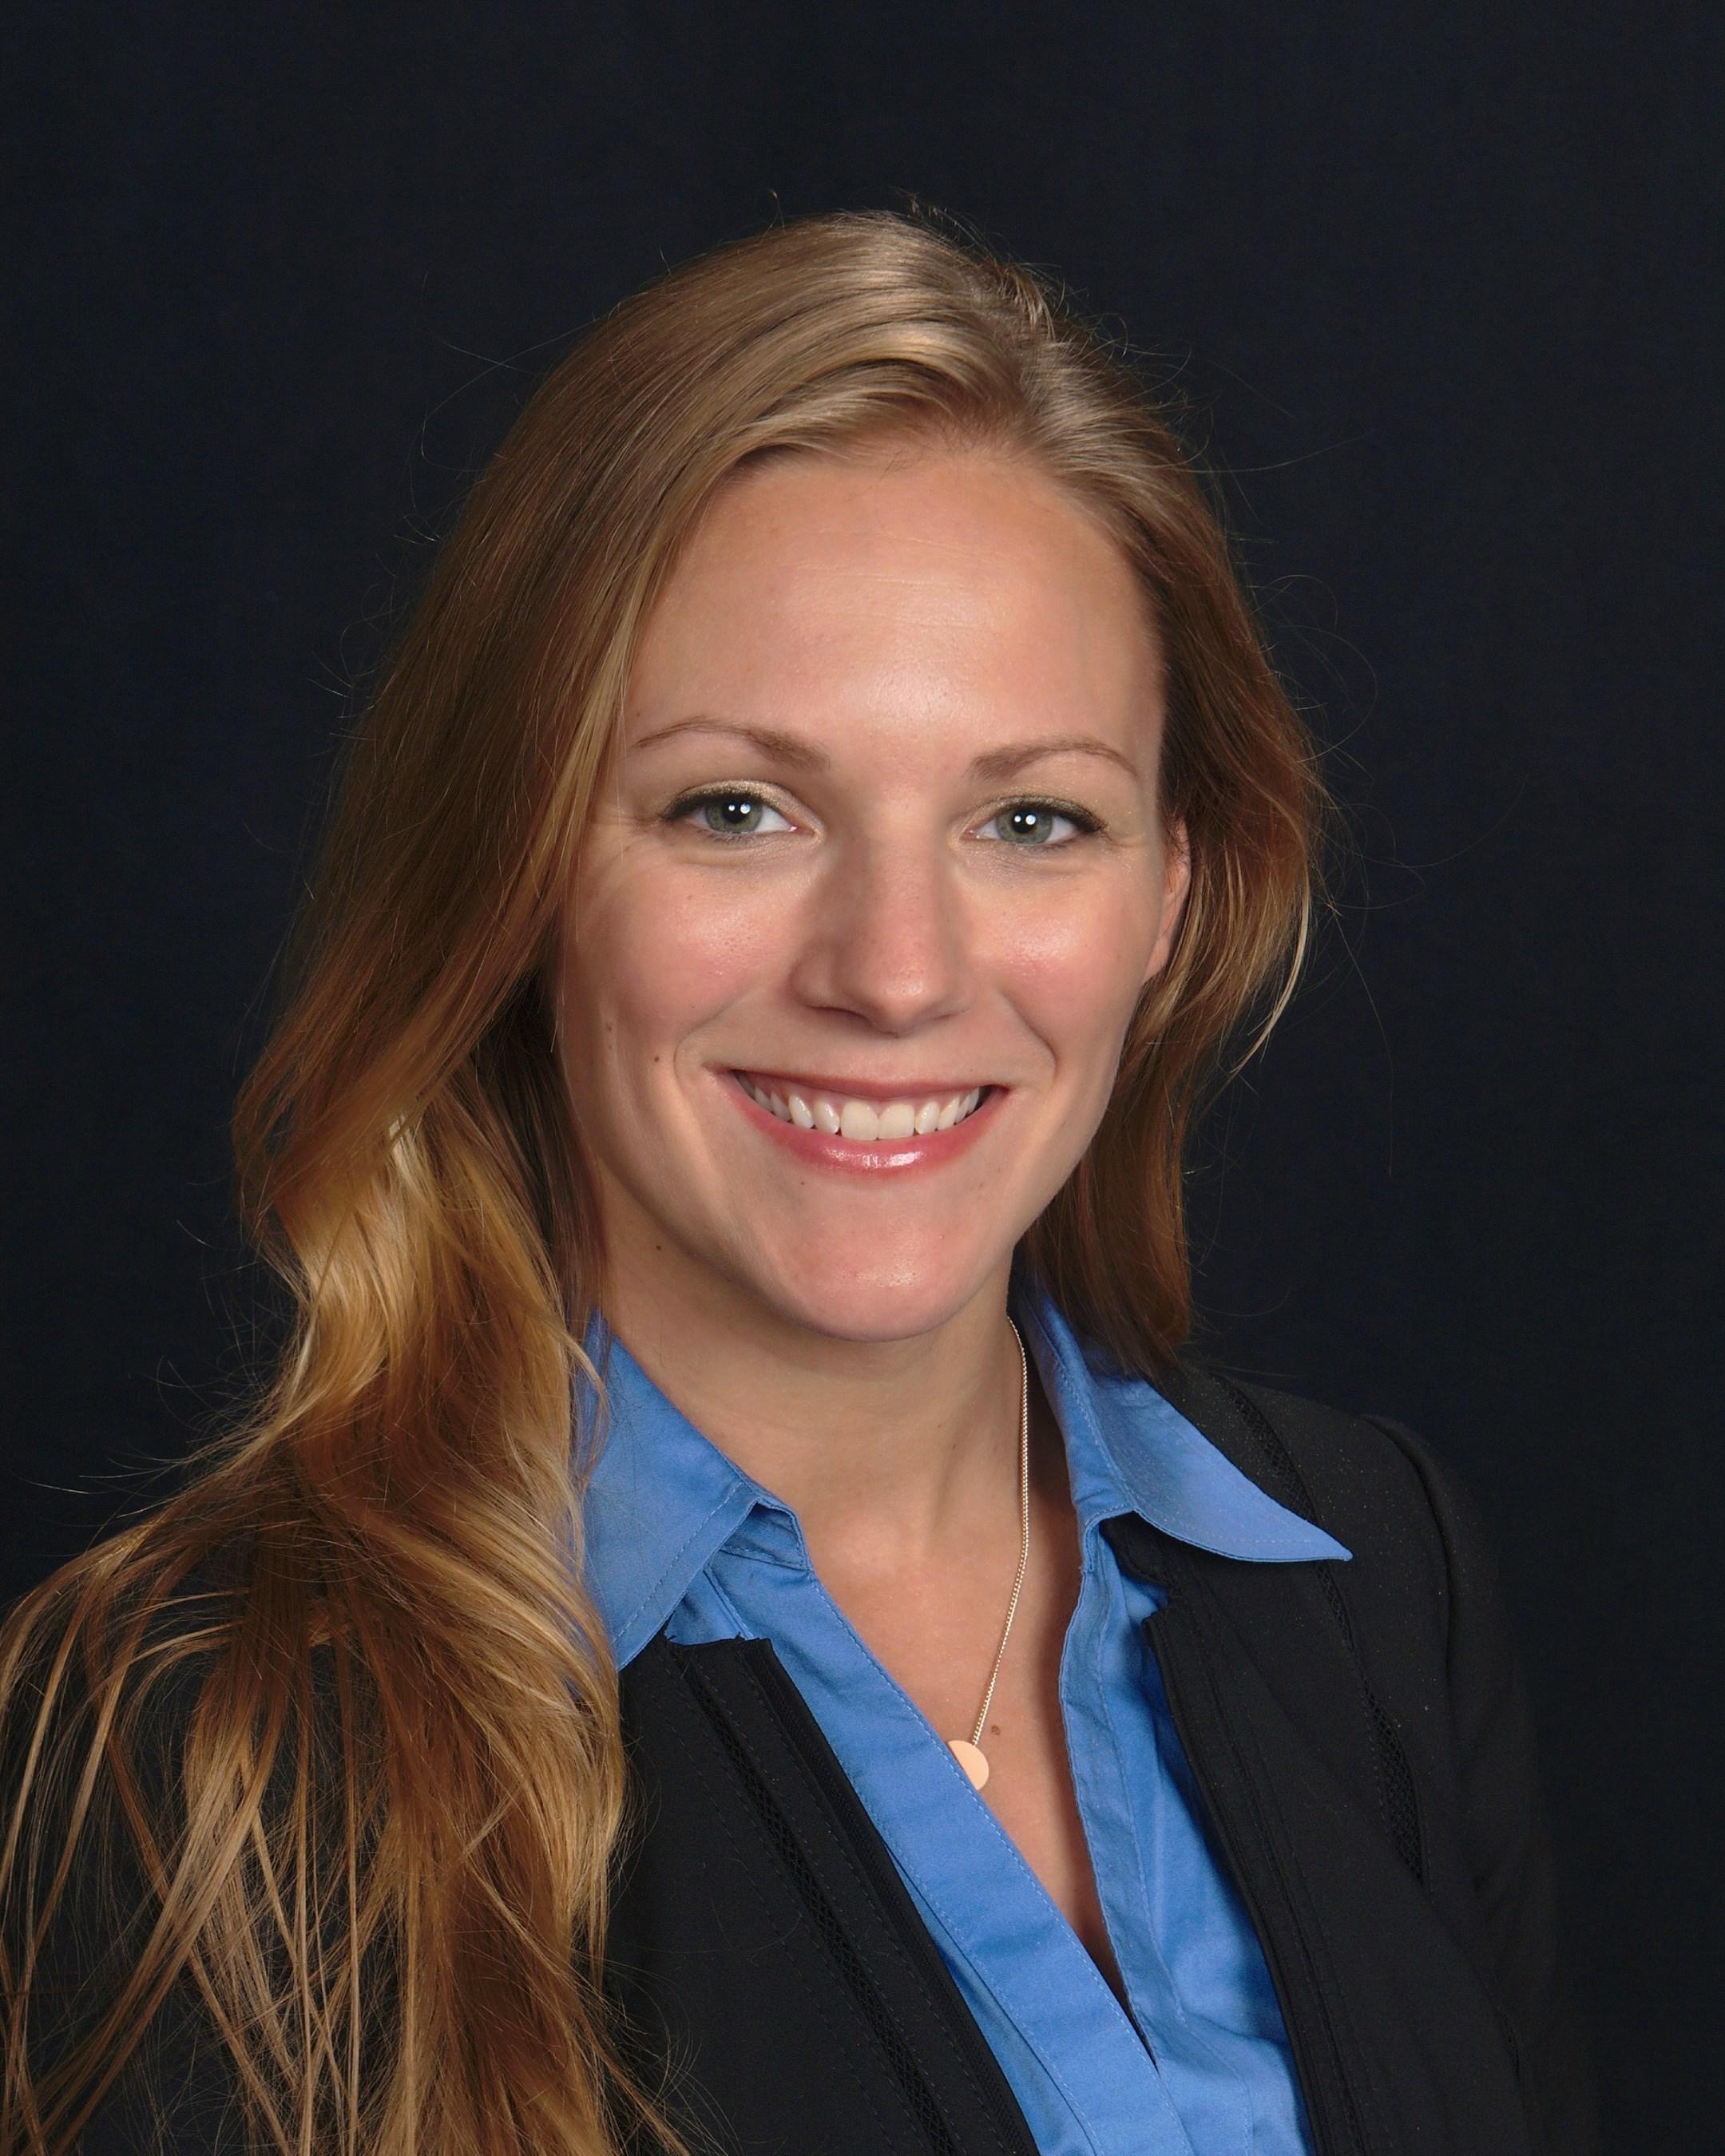 Amy Miksis, AVP - Business Development